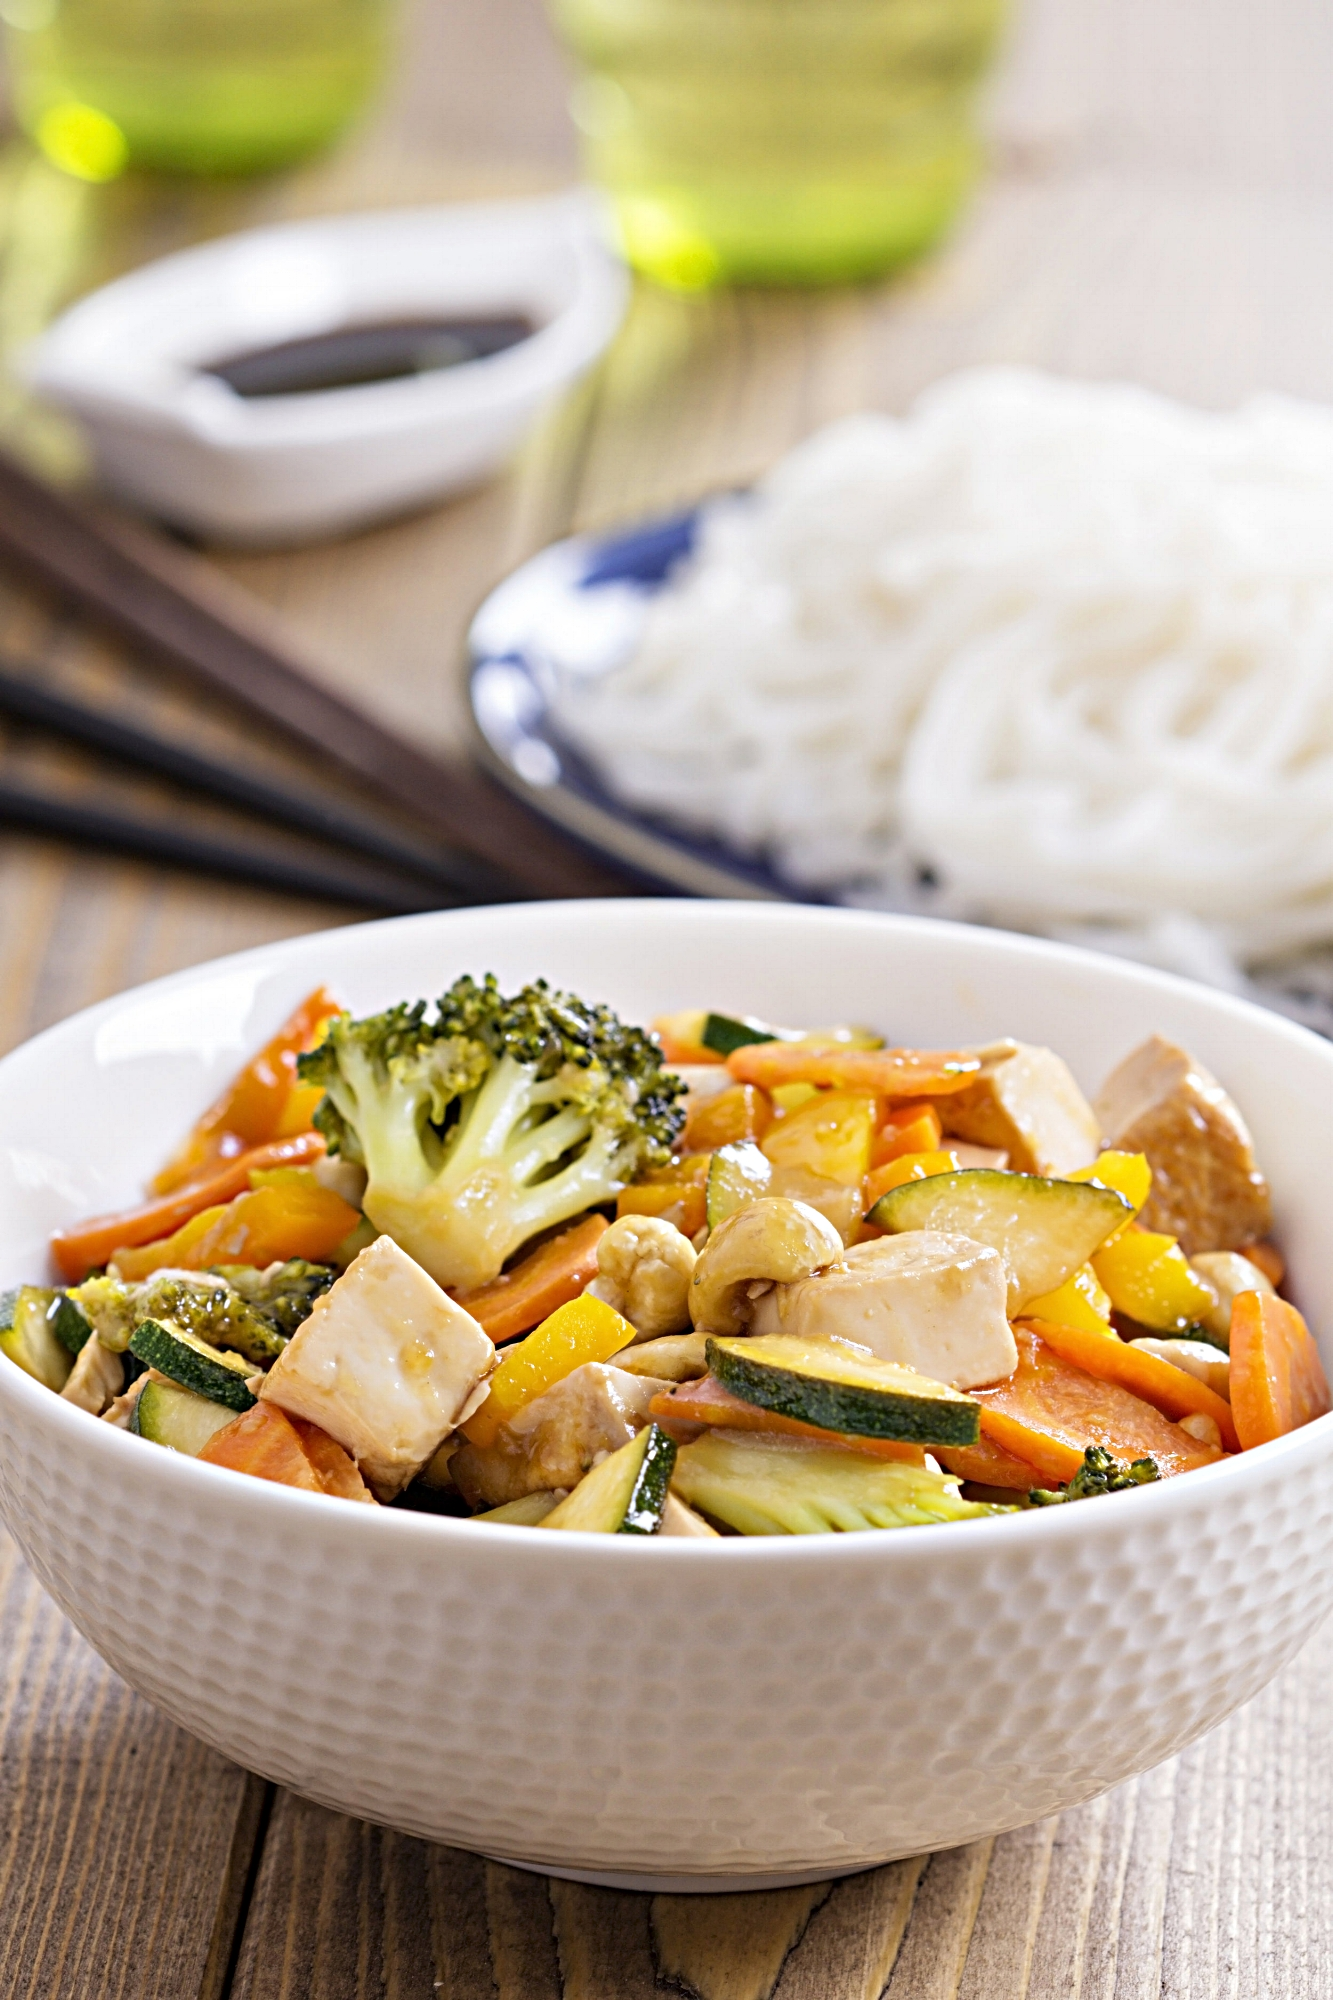 Tofu & Cashew stir fry over rice.jpg